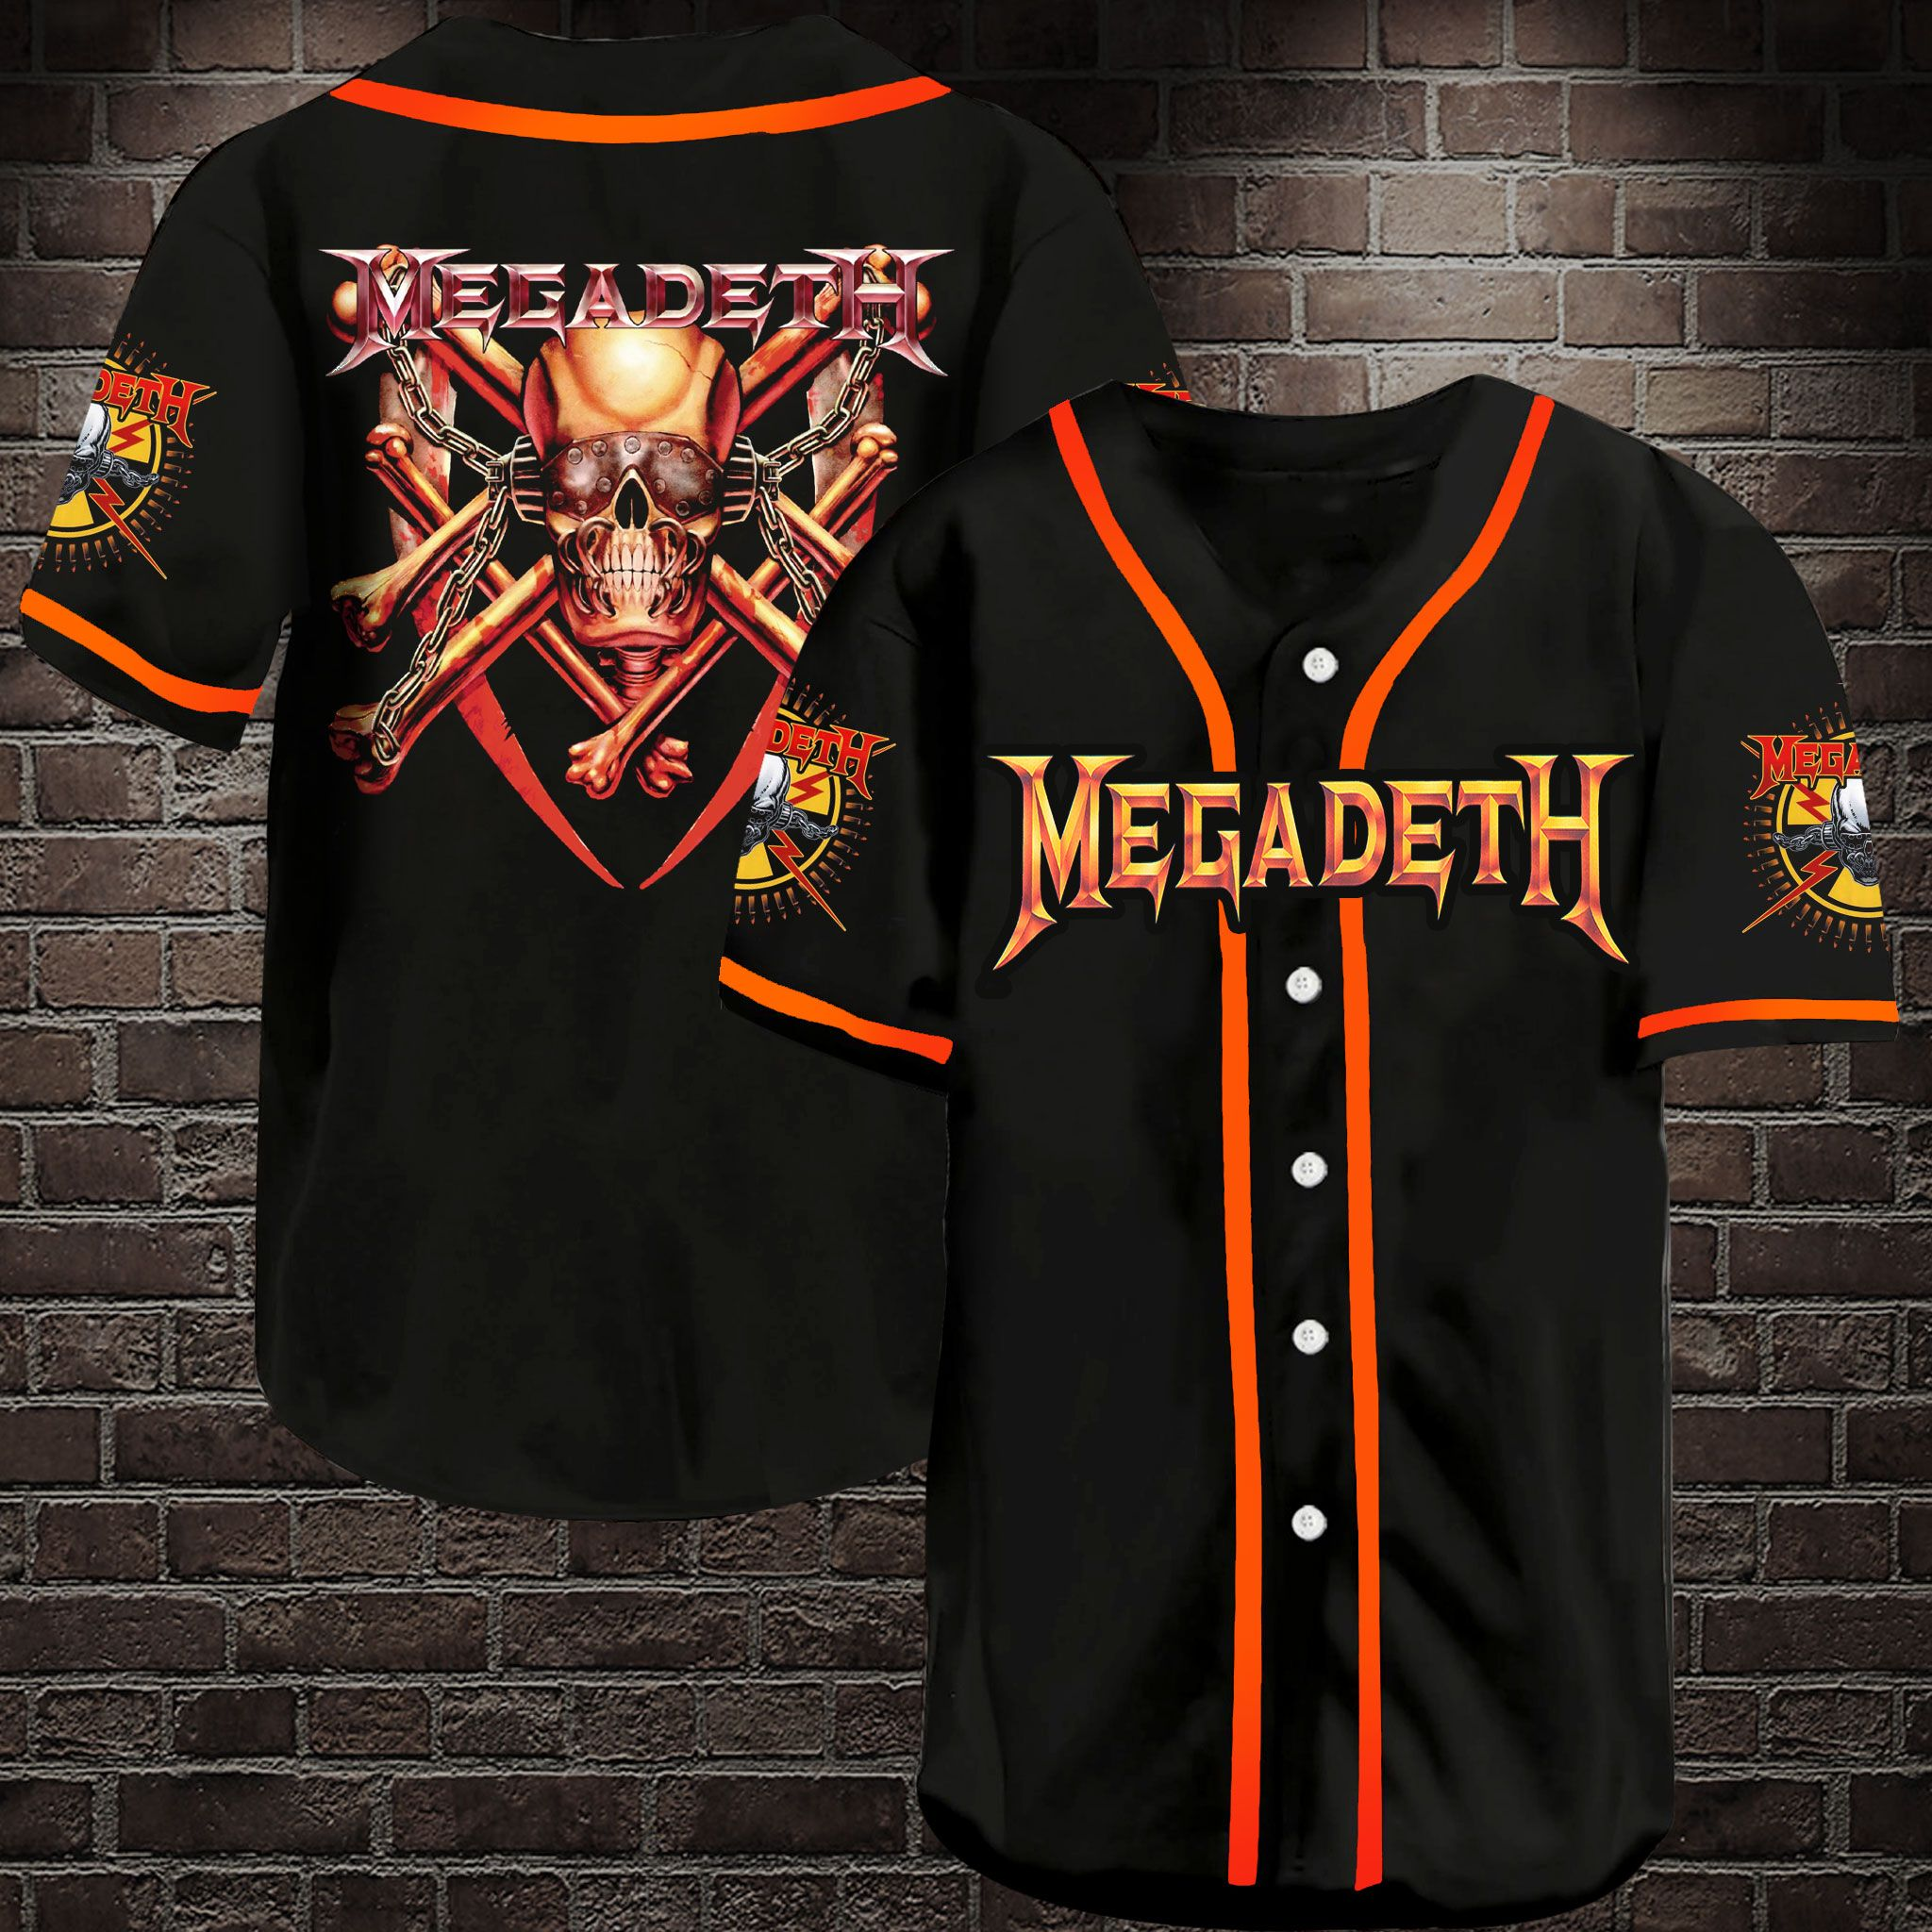 Megadeth Baseball Jersey Shirt